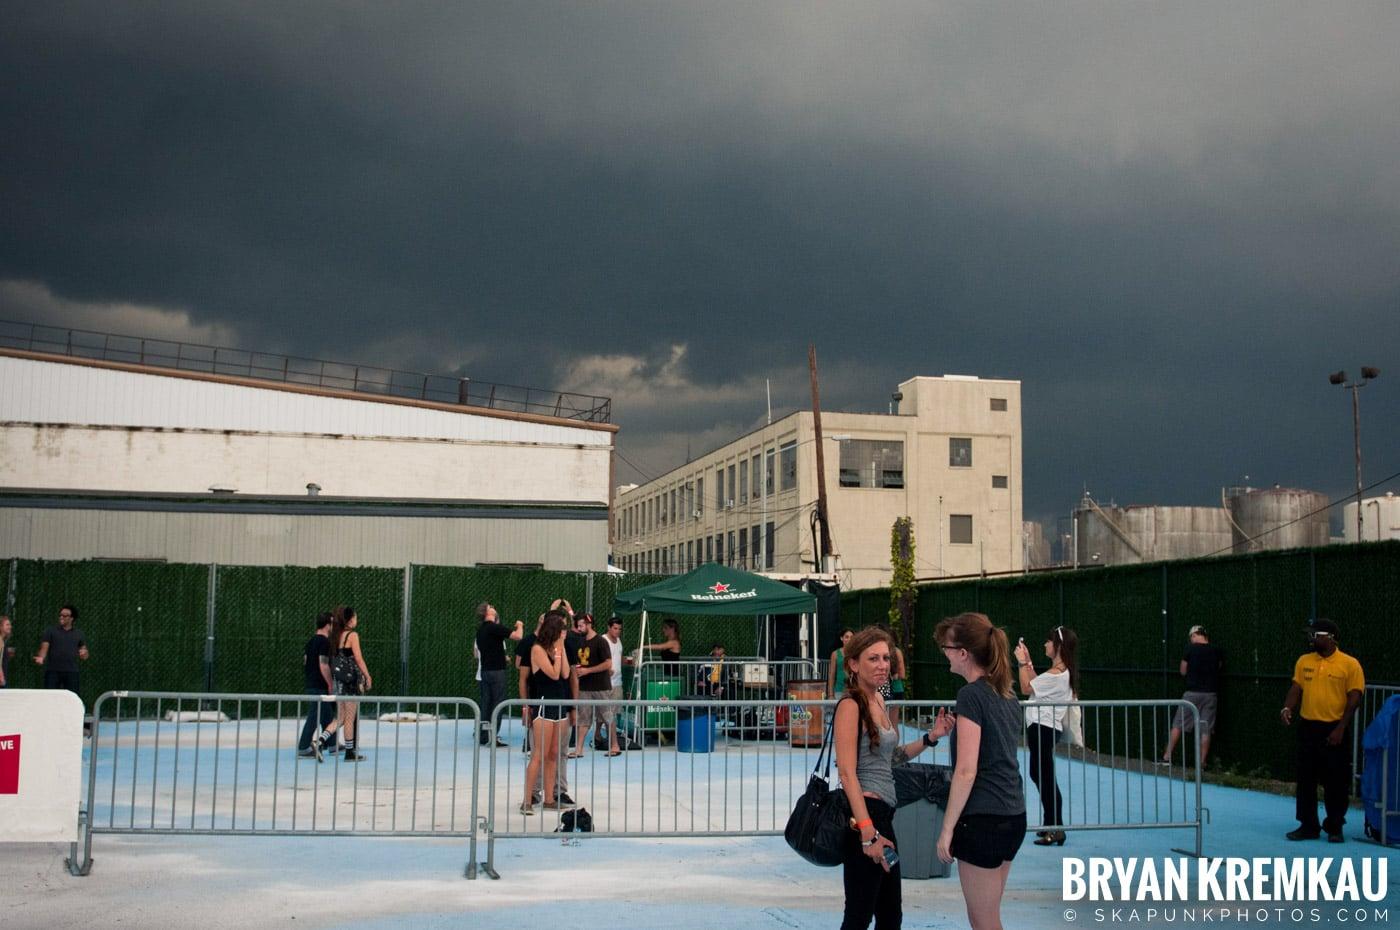 The Bronx @ Riot Fest 2012, Williamsburg Park NY - 9.8.12 (7)